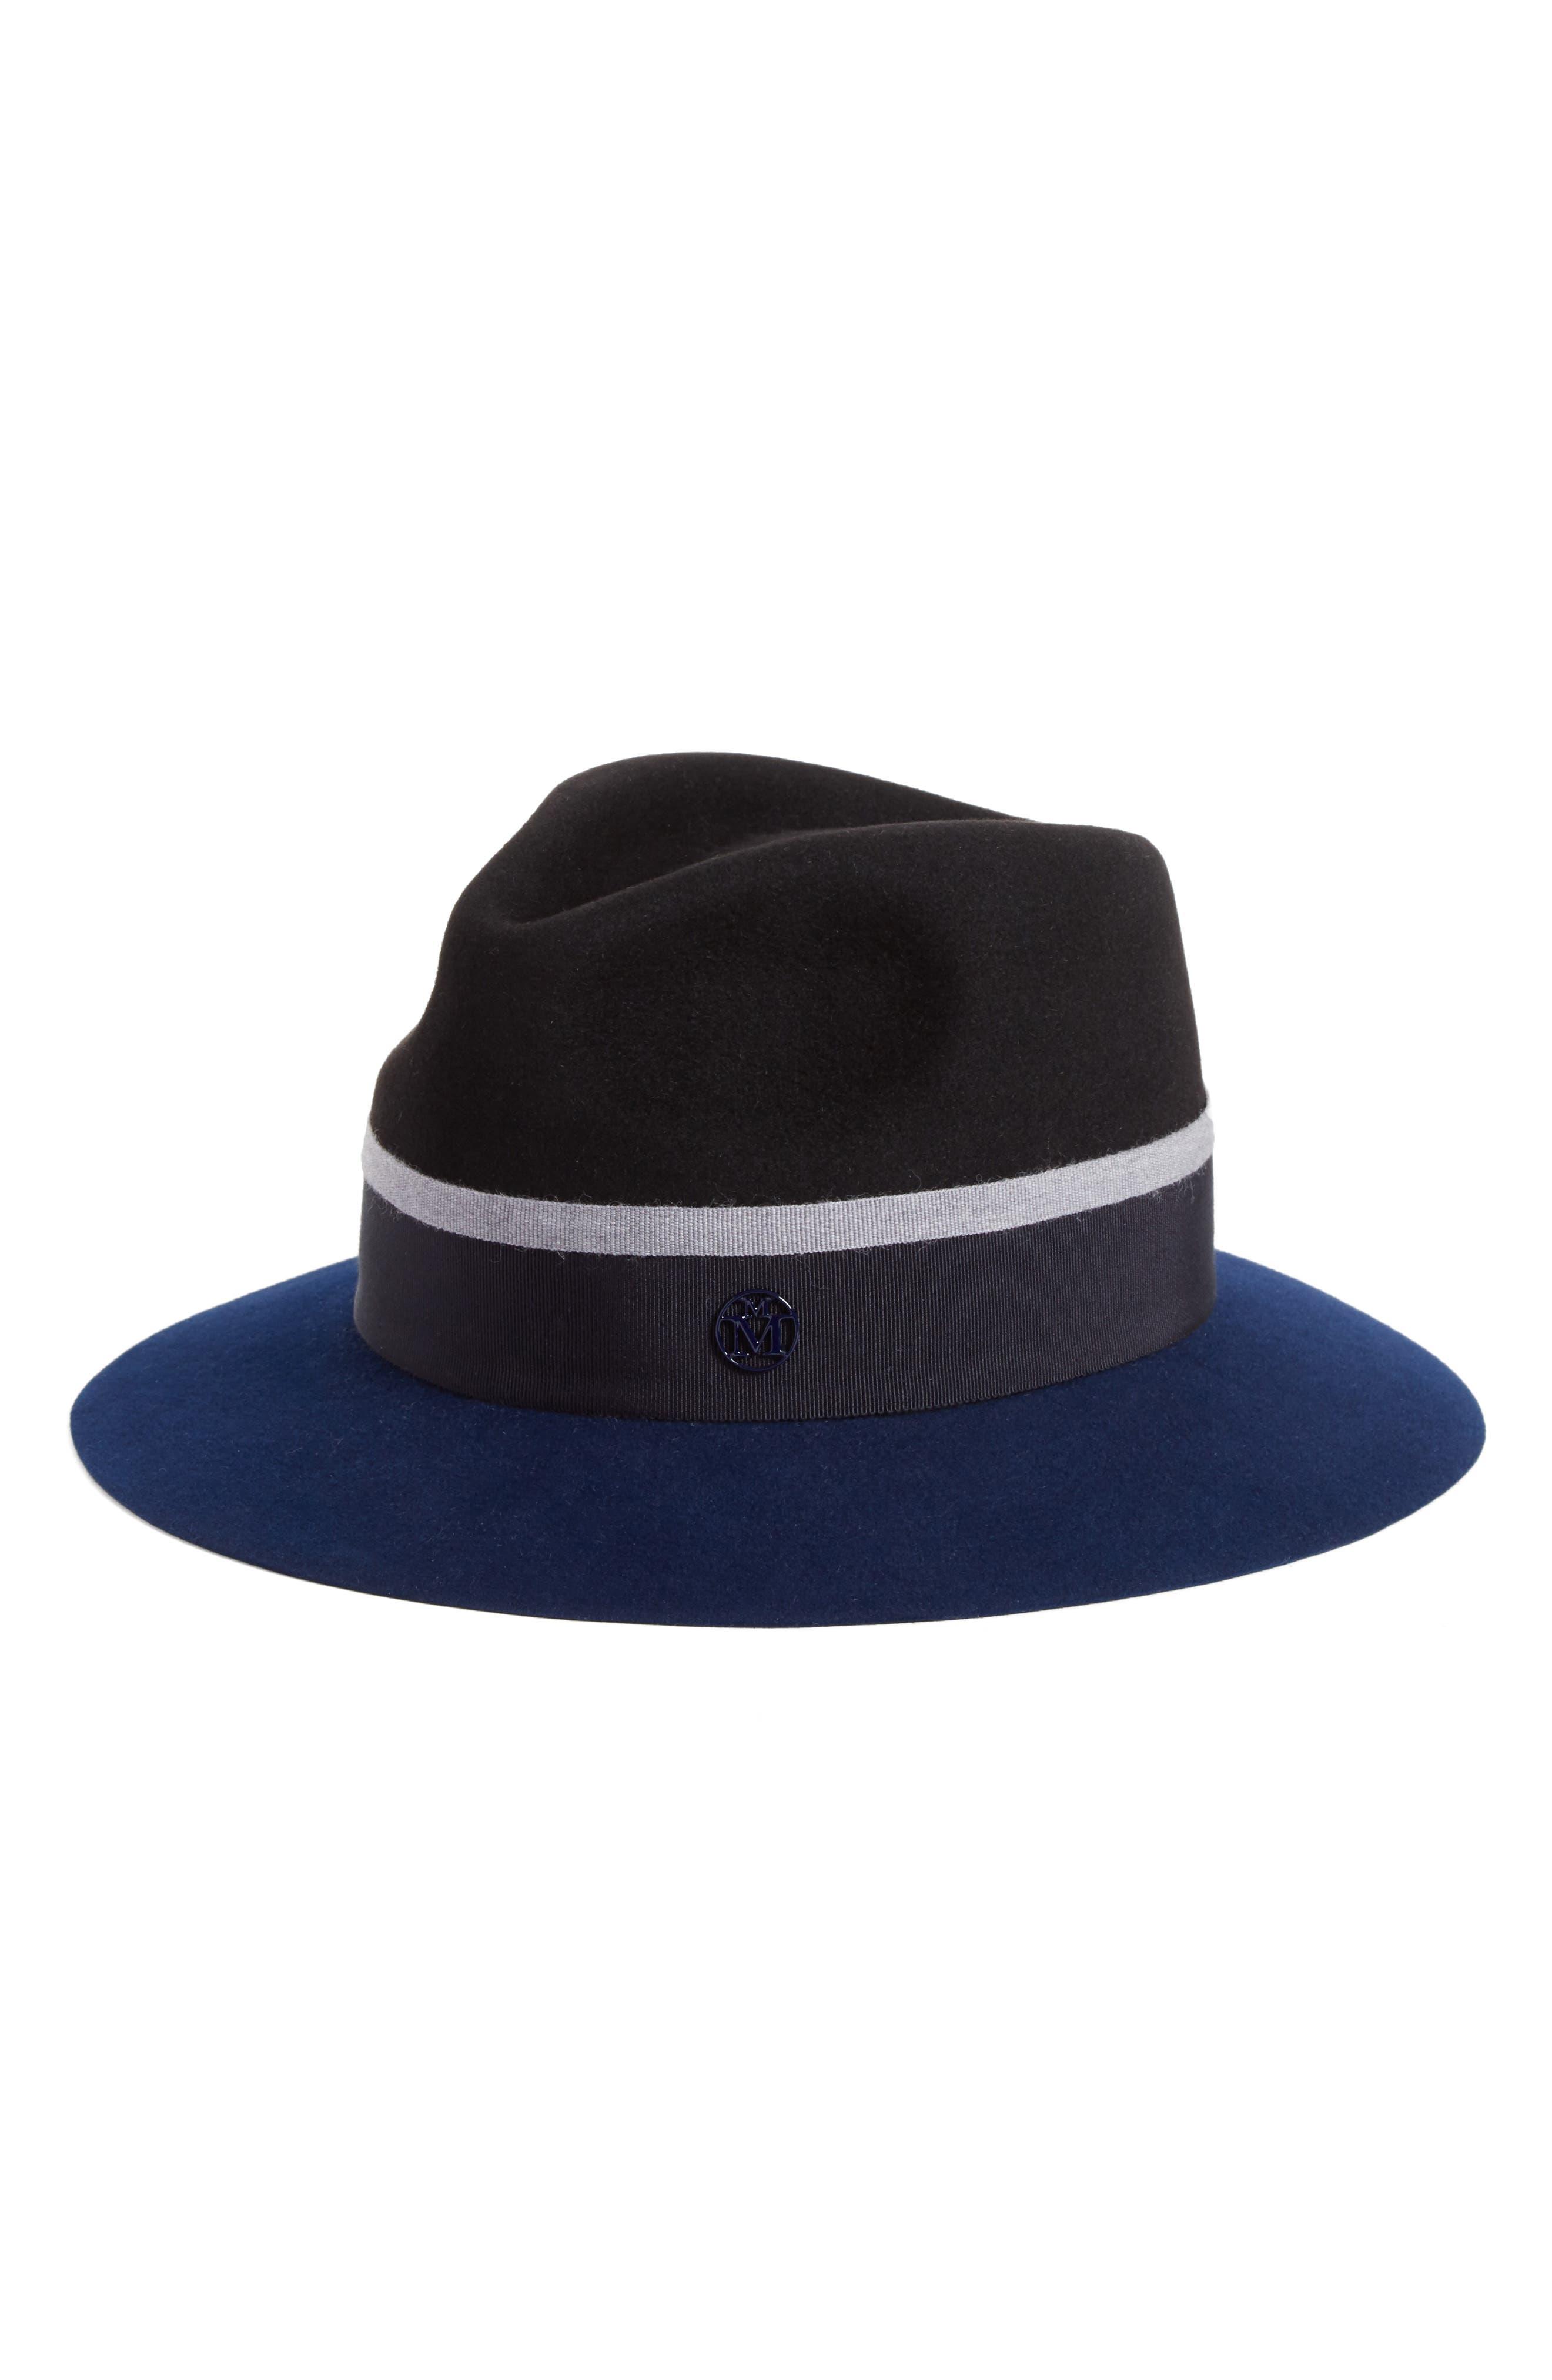 Rico Fur Felt Hat,                             Main thumbnail 1, color,                             001